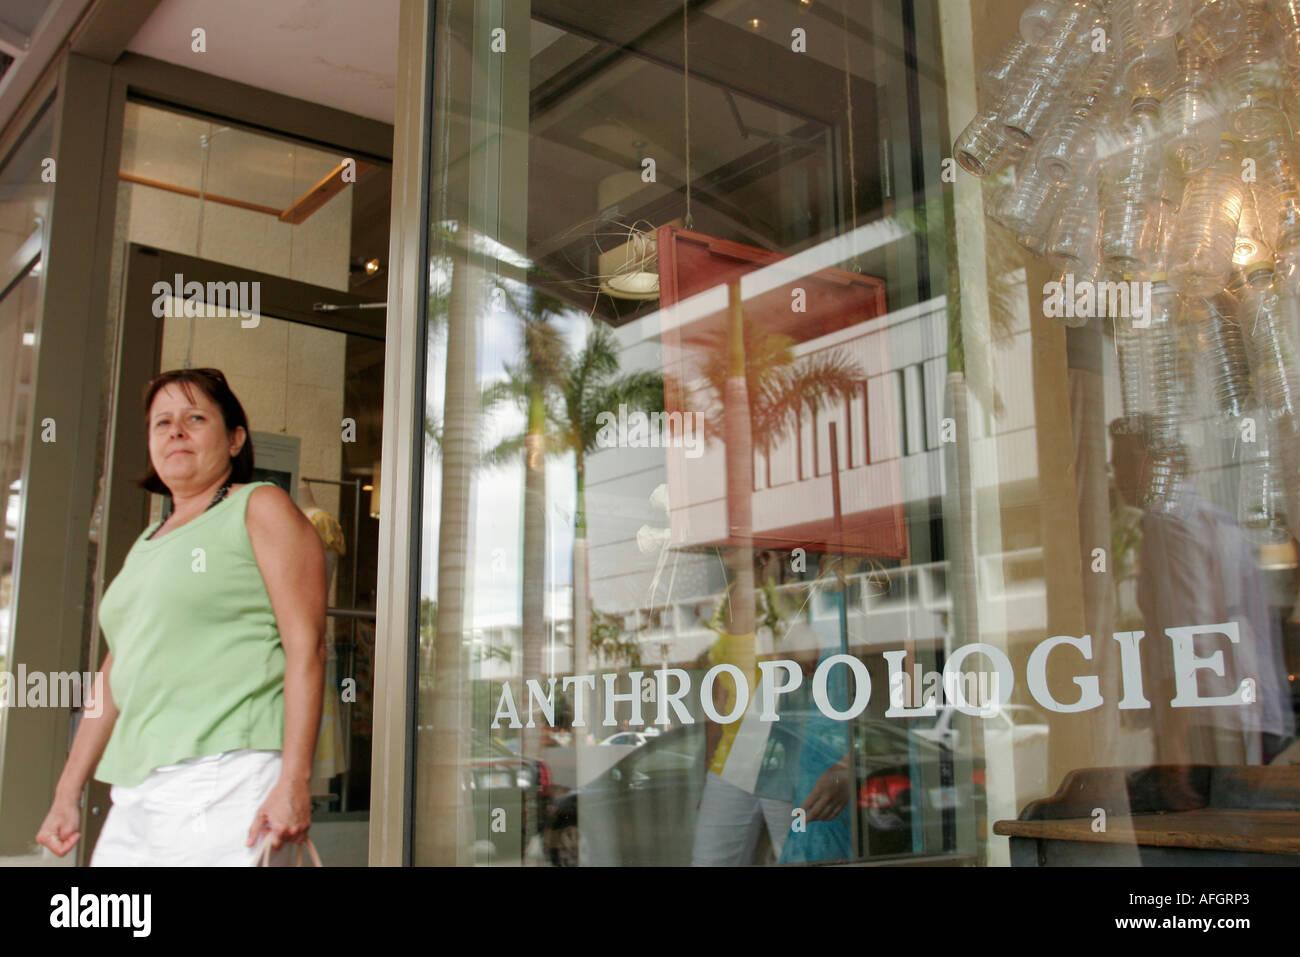 Anthropologie Lincoln Road Miami Beach